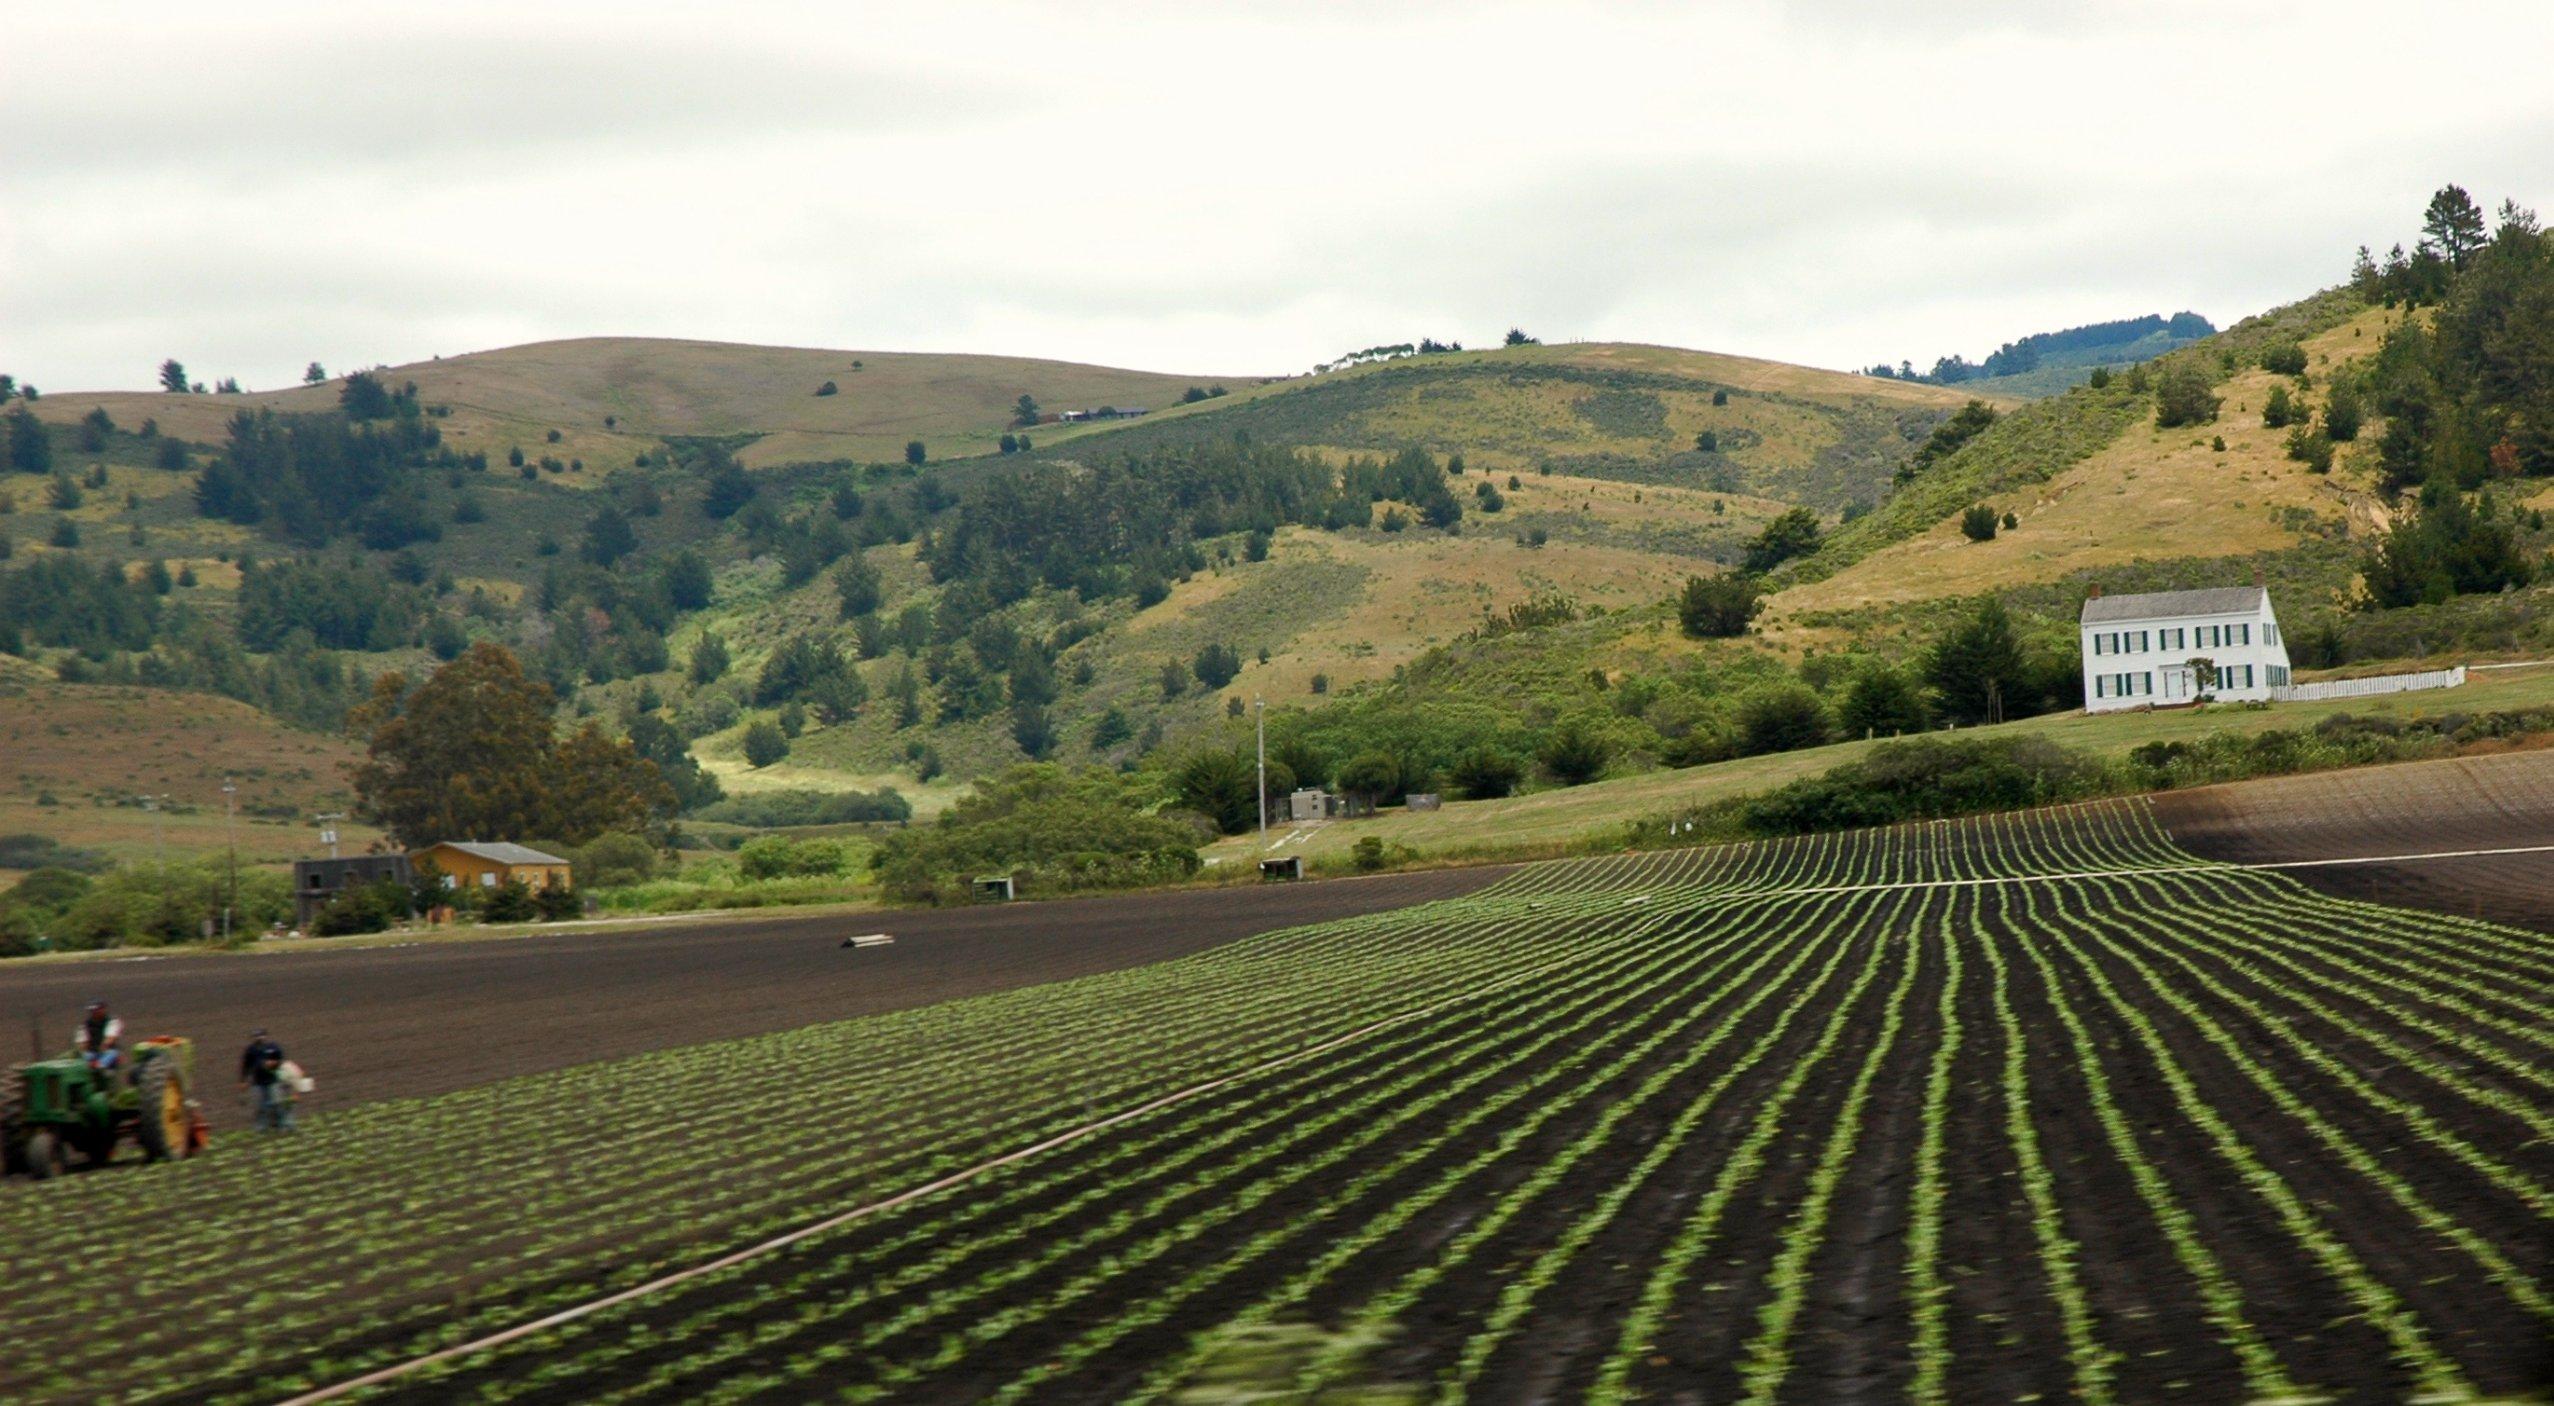 Long_fields_with_farm_in_California